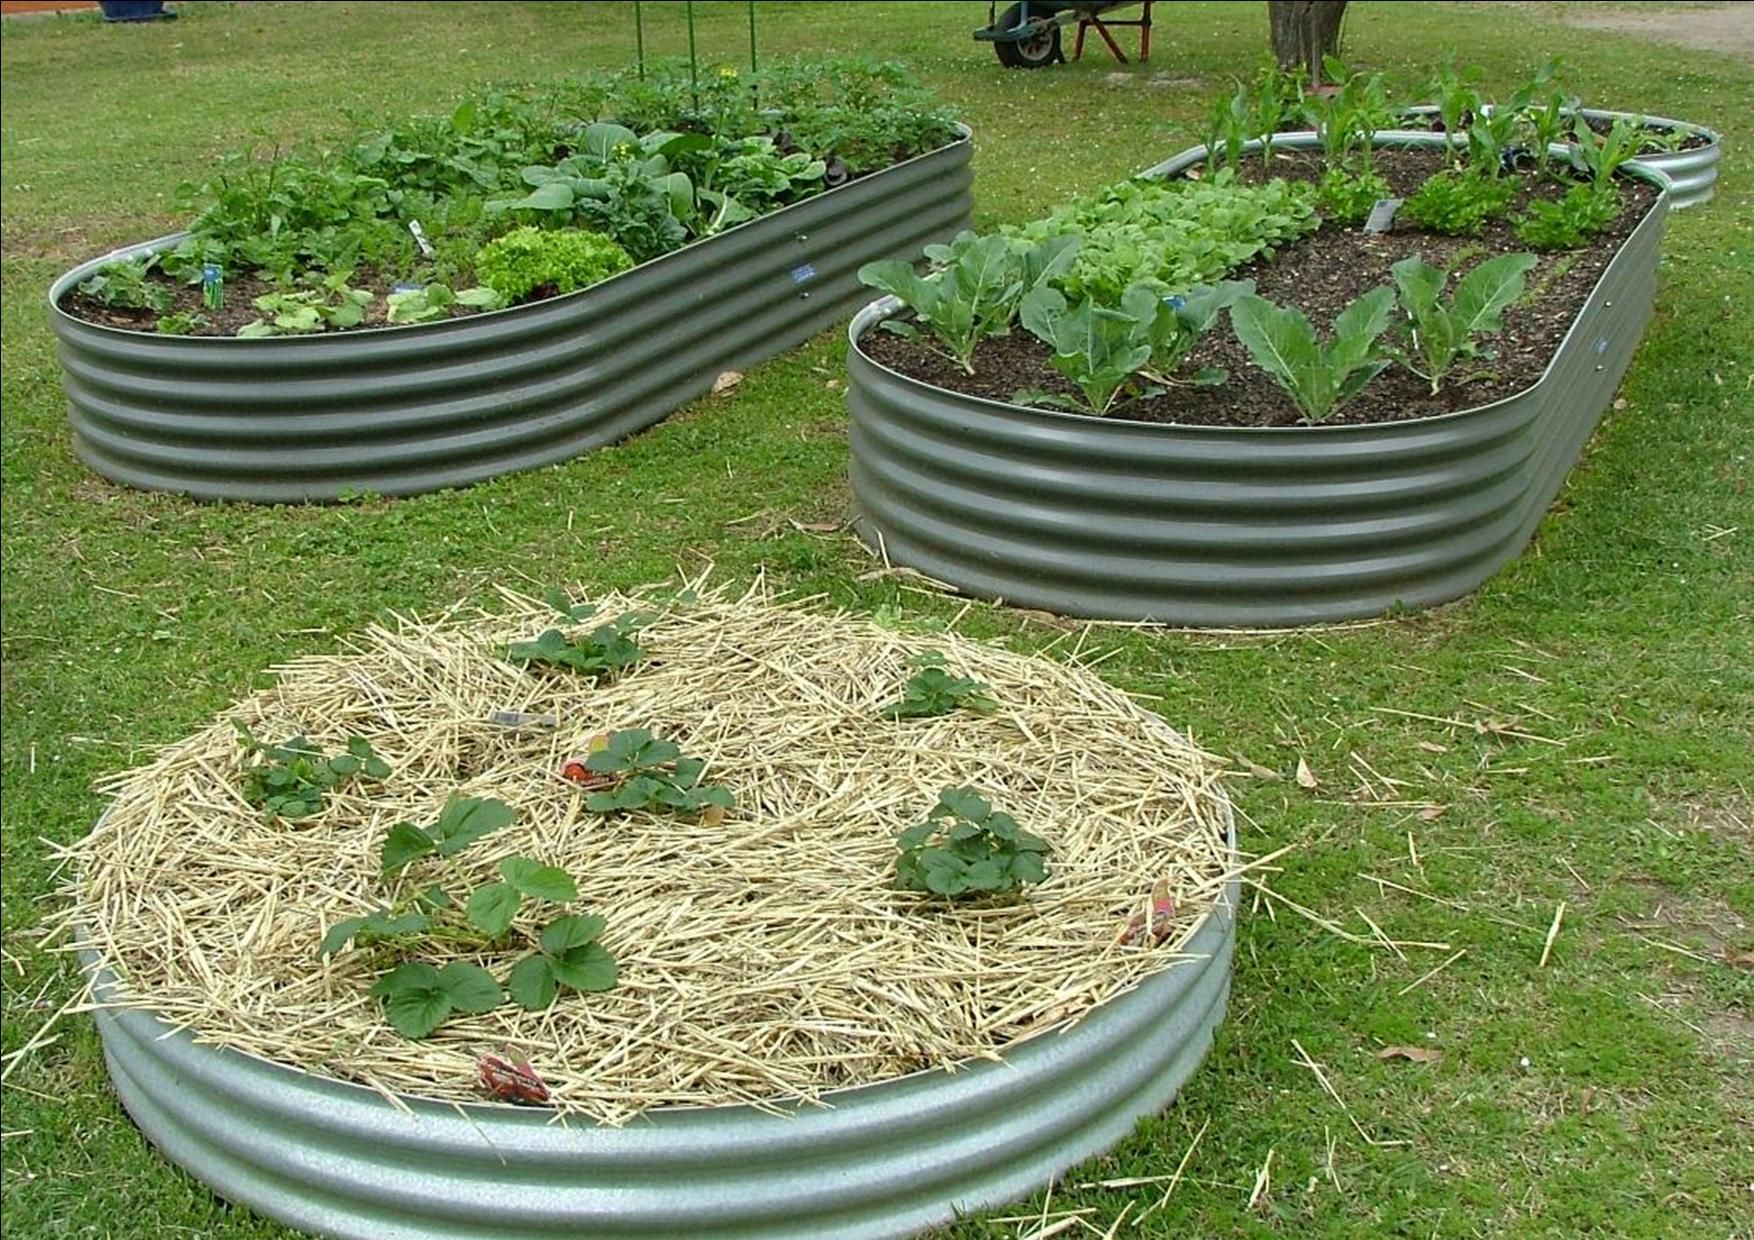 Homemade Galvanized Raised Garden Beds Garden Tank